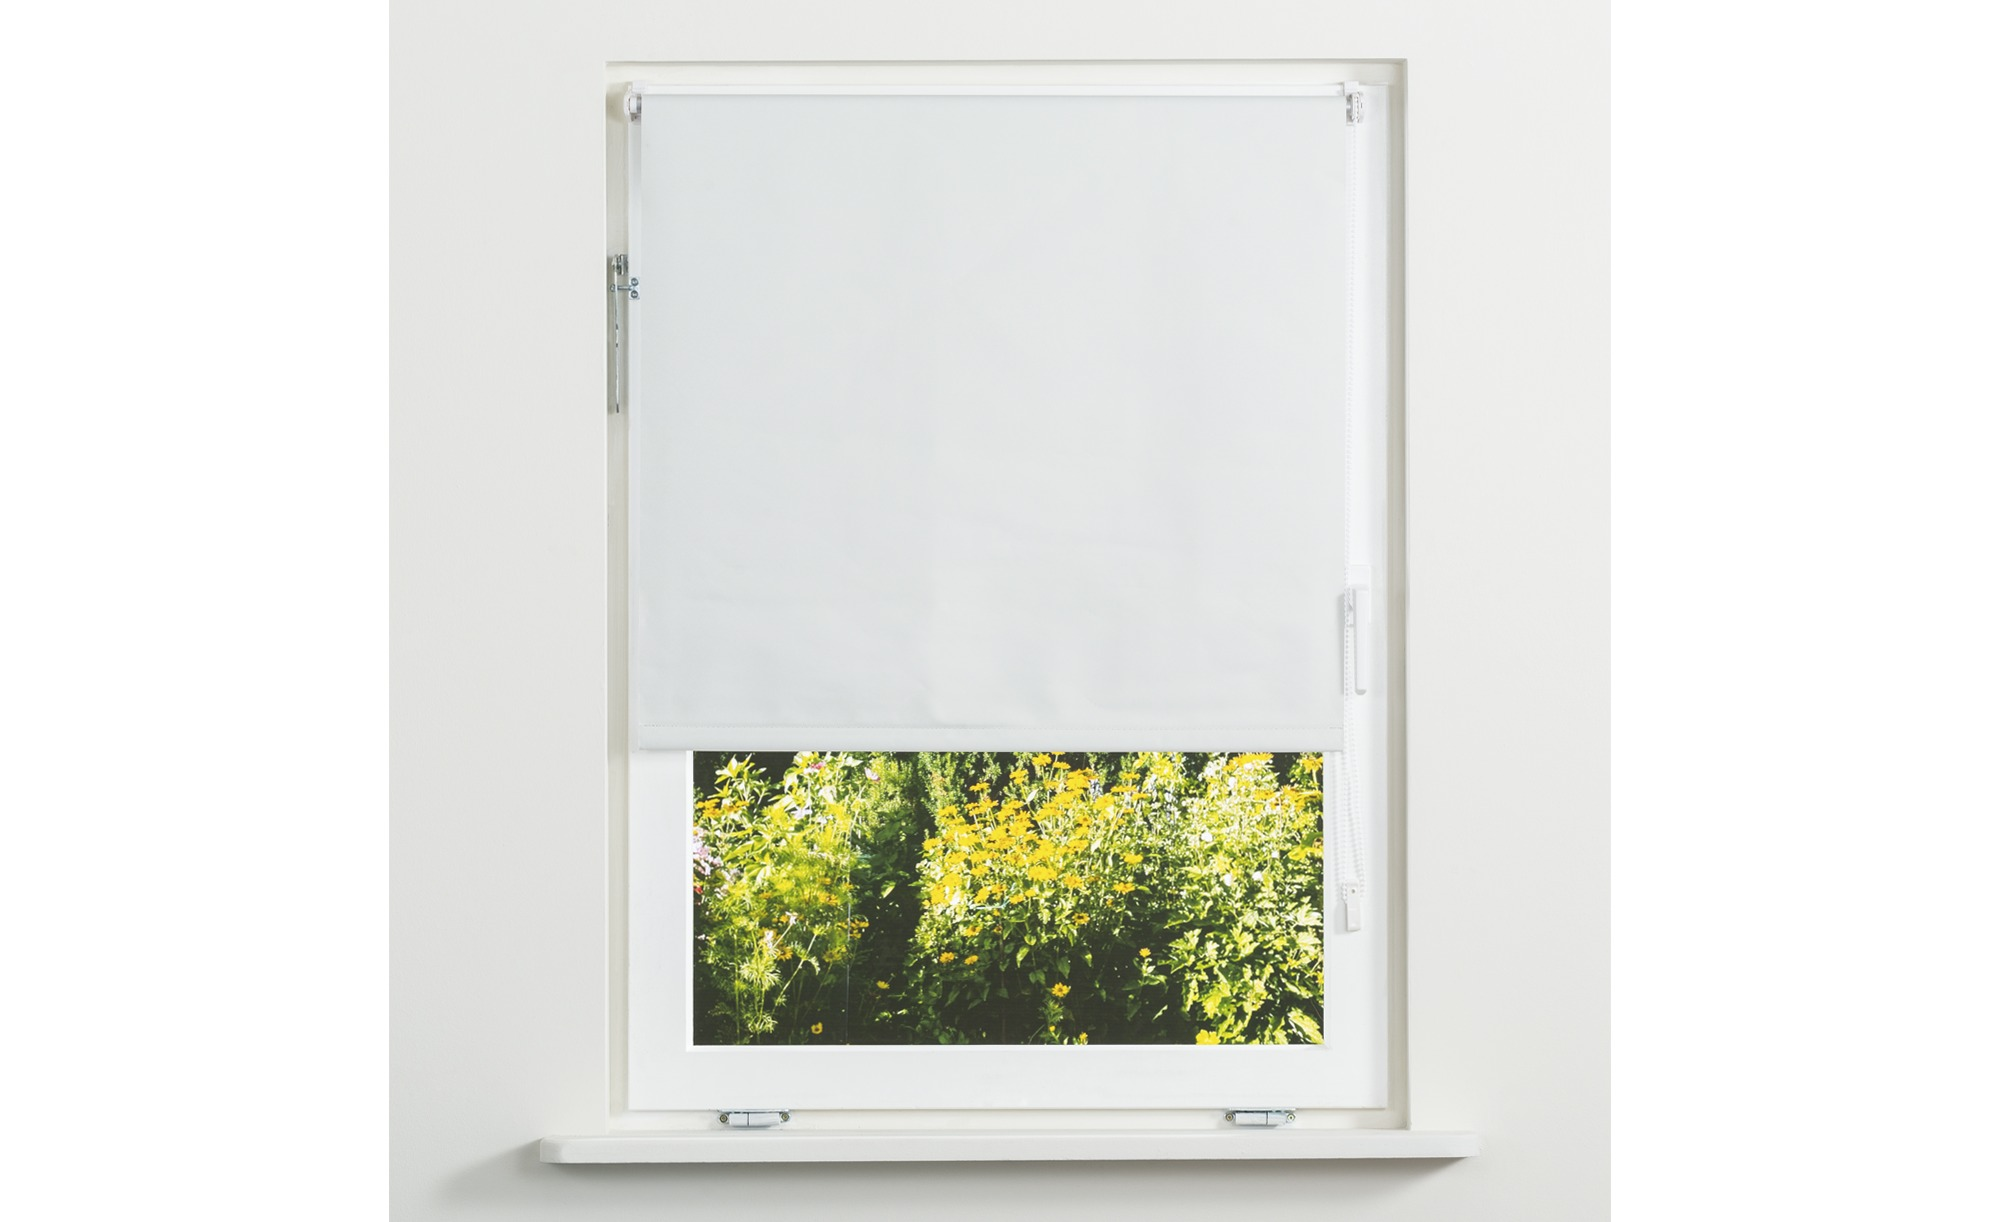 Rollo Klemmfix - weiß - Polyester - 100 cm - Sconto   Heimtextilien > Jalousien und Rollos > Verdunklungsrollos   Sconto